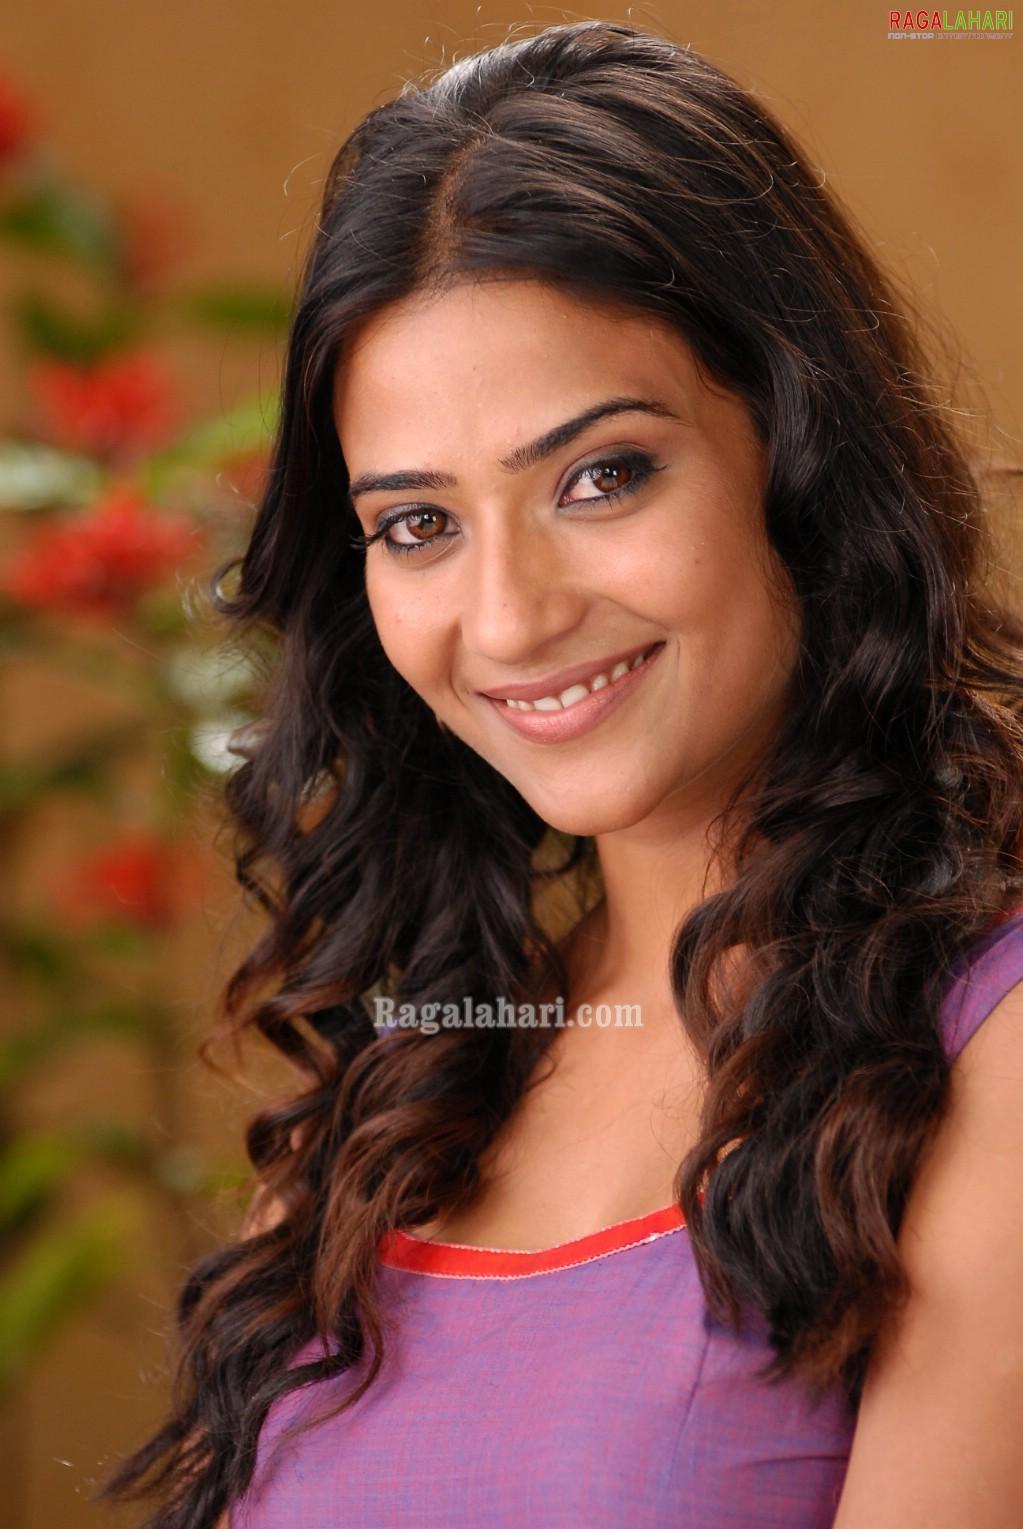 aditi sharma image 12 | tollywood heroines photos,telugu movie